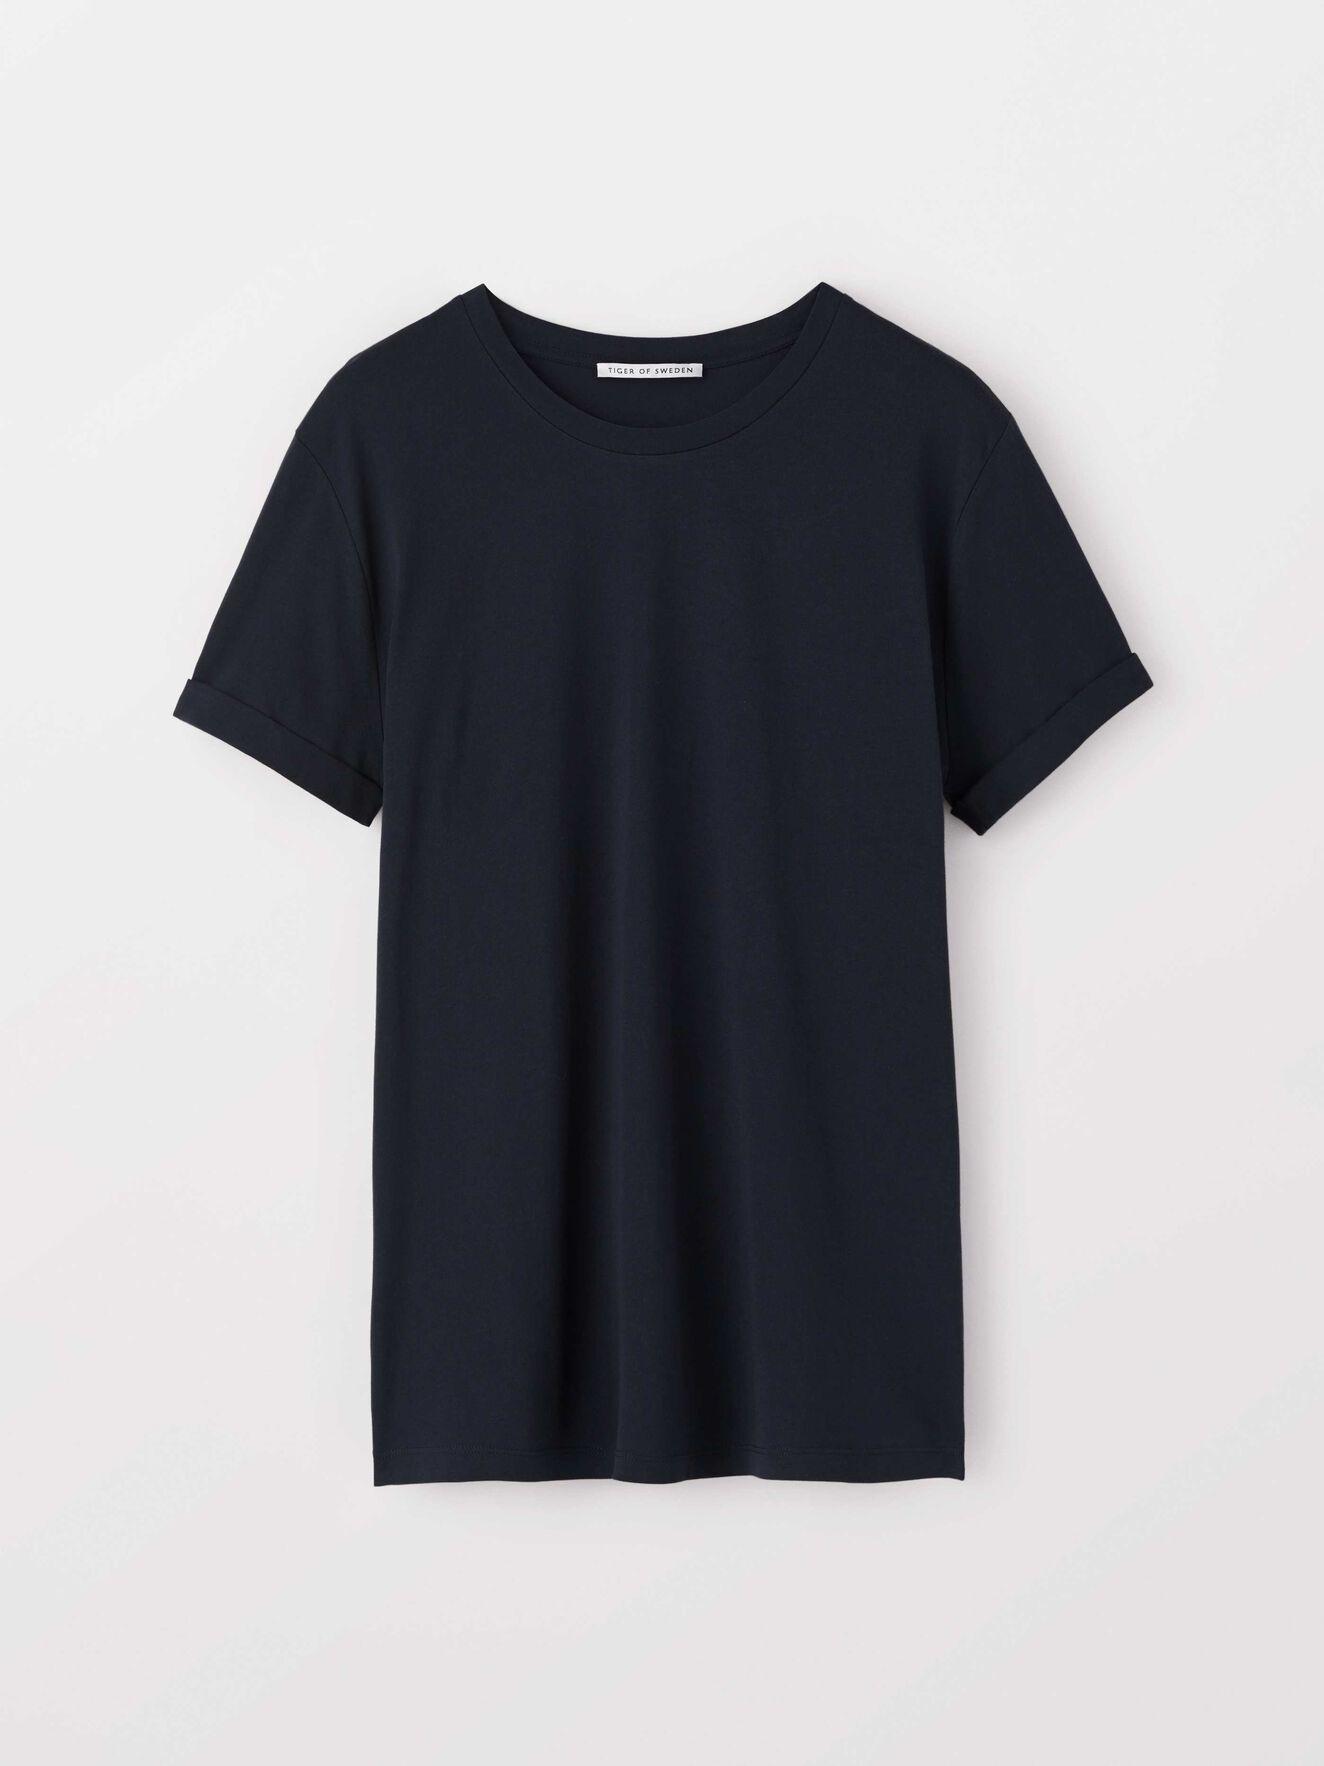 Kiet T-Shirt in Navy from Tiger of Sweden